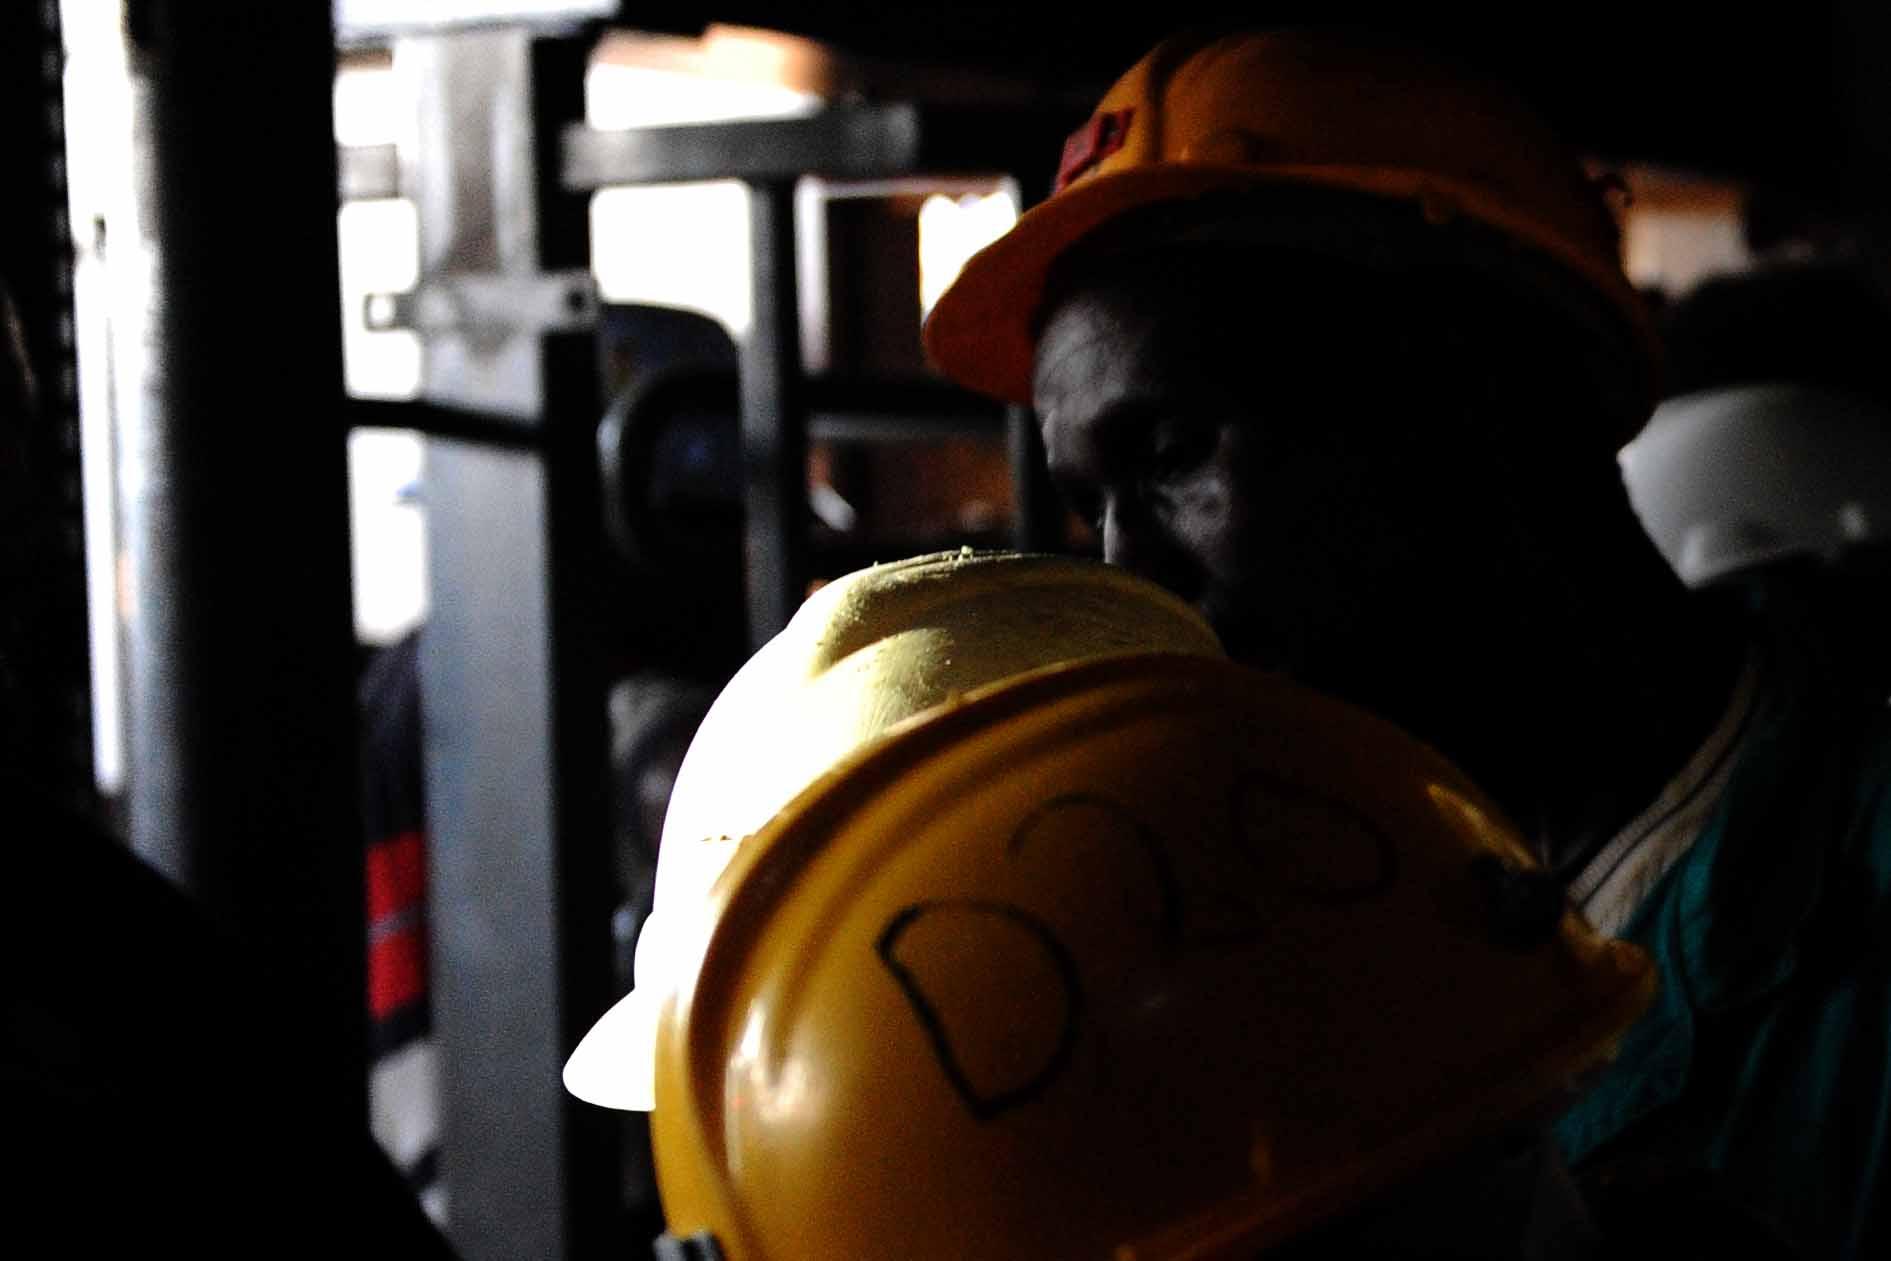 Dept owns Kuruman mining rights – ConCourt